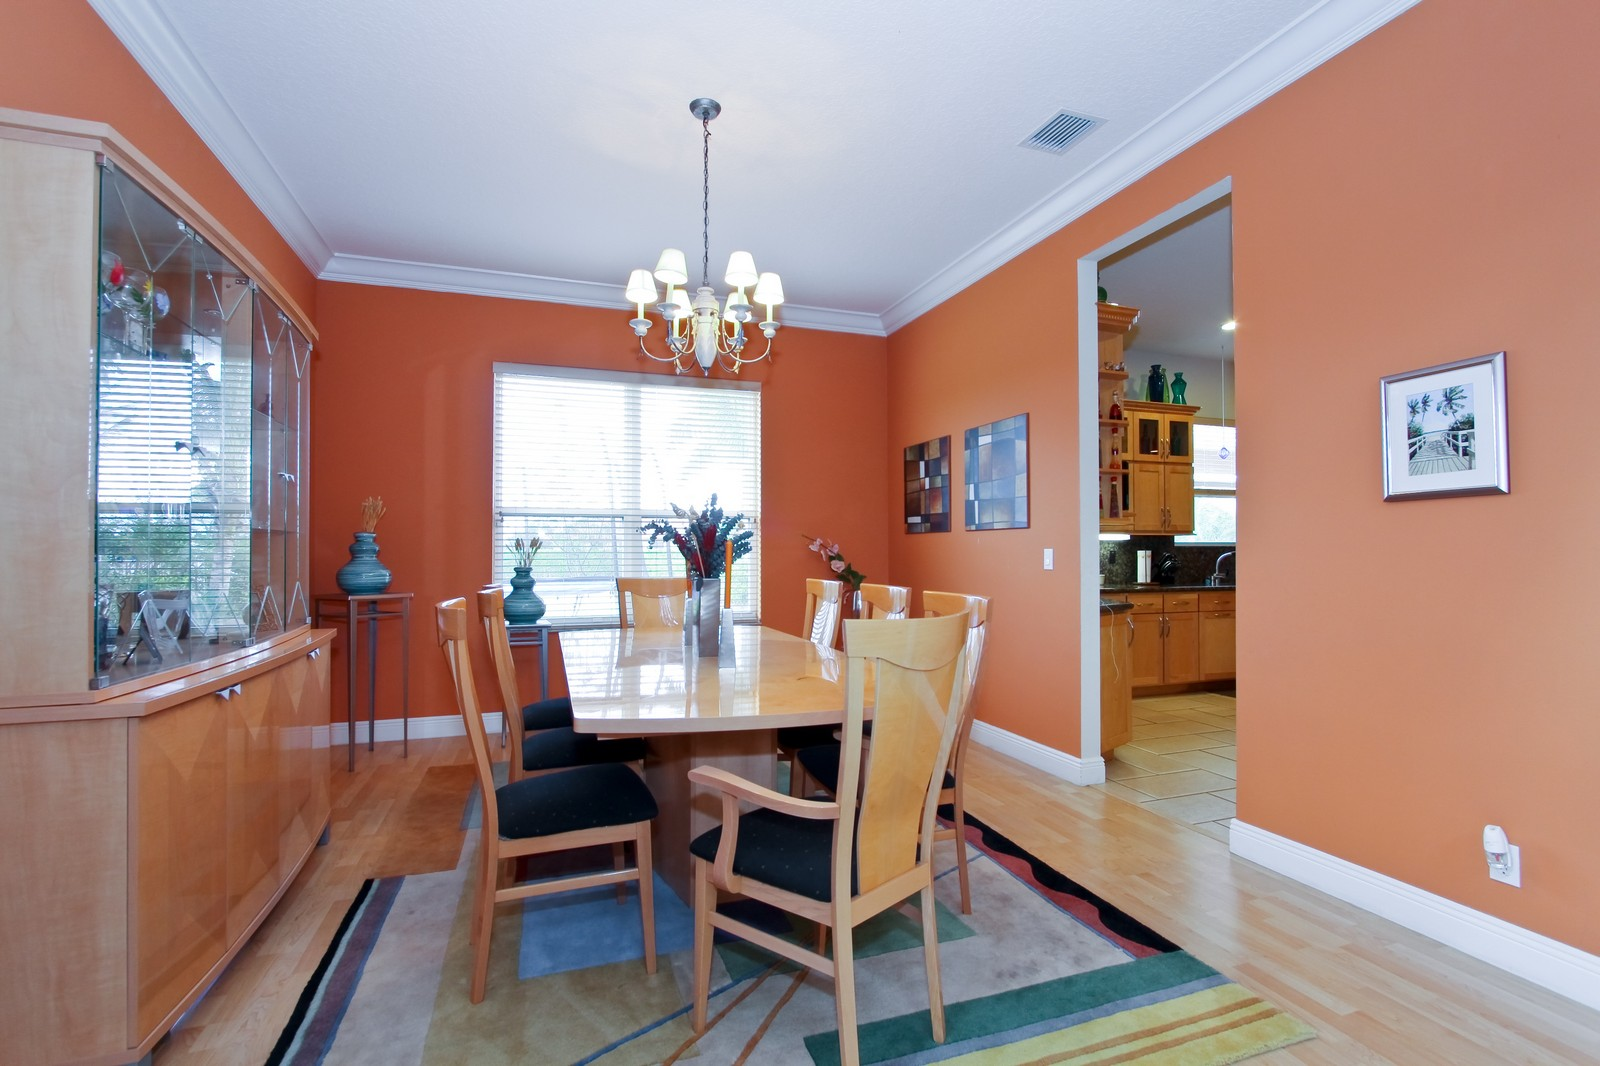 Real Estate Photography - 14542 Draft Horse Ln, Wellington, FL, 33414 - Dining Room